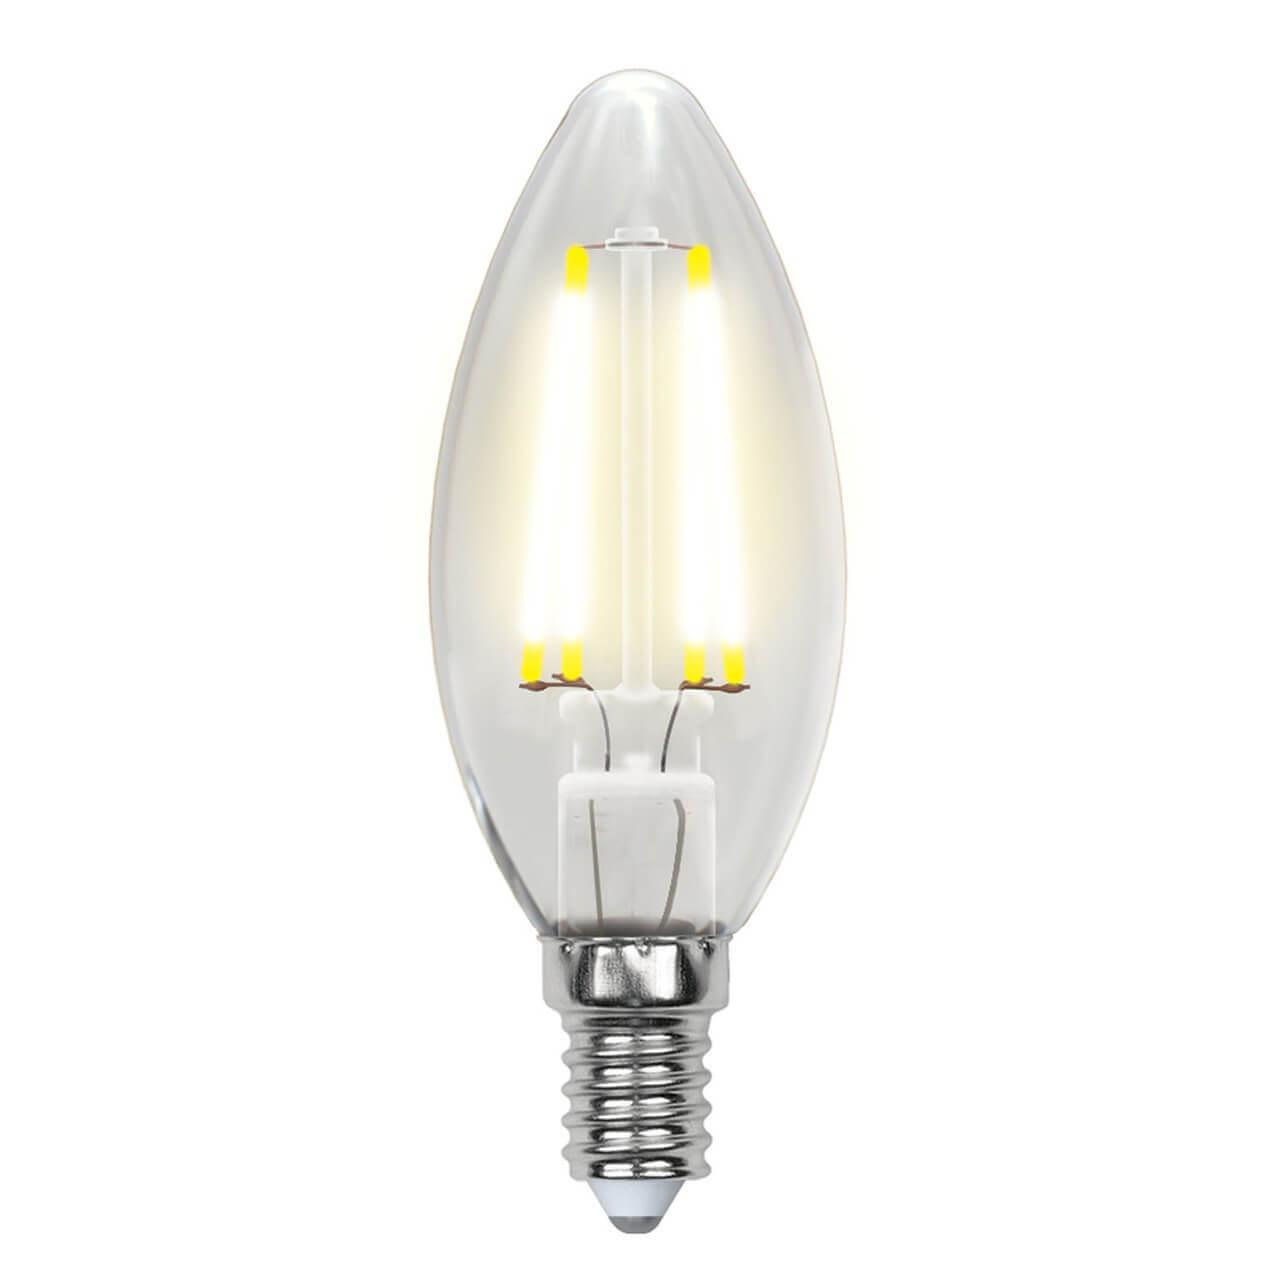 цена на Лампочка Uniel LED-C35-6W/NW/E14/CL GLA01TR AIR C